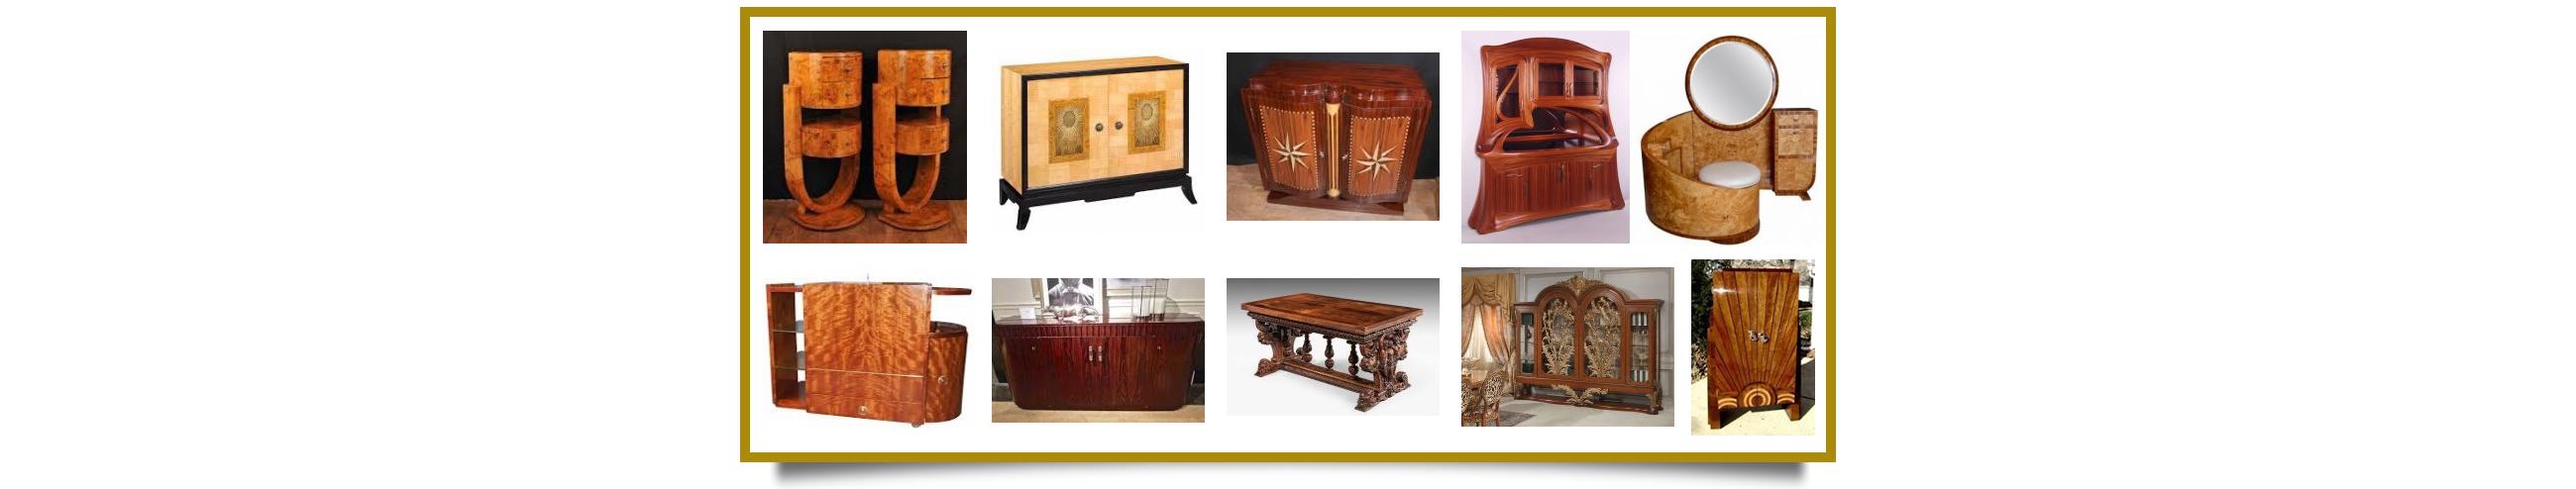 Wood Furniture Repair Essex County Nj